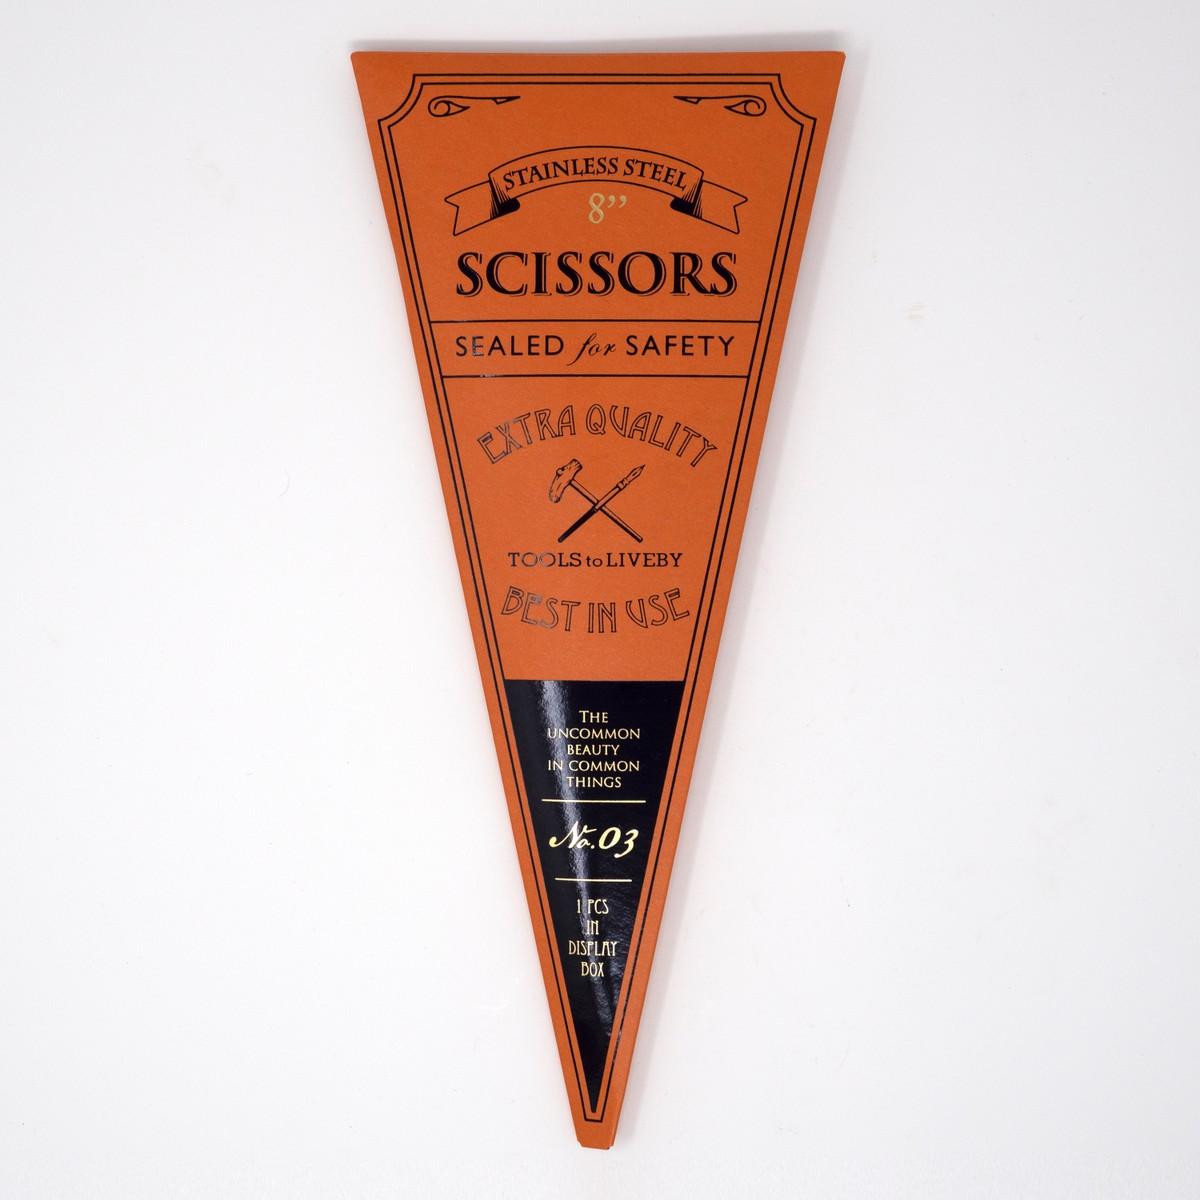 Photo of Stainless Steel Scissors